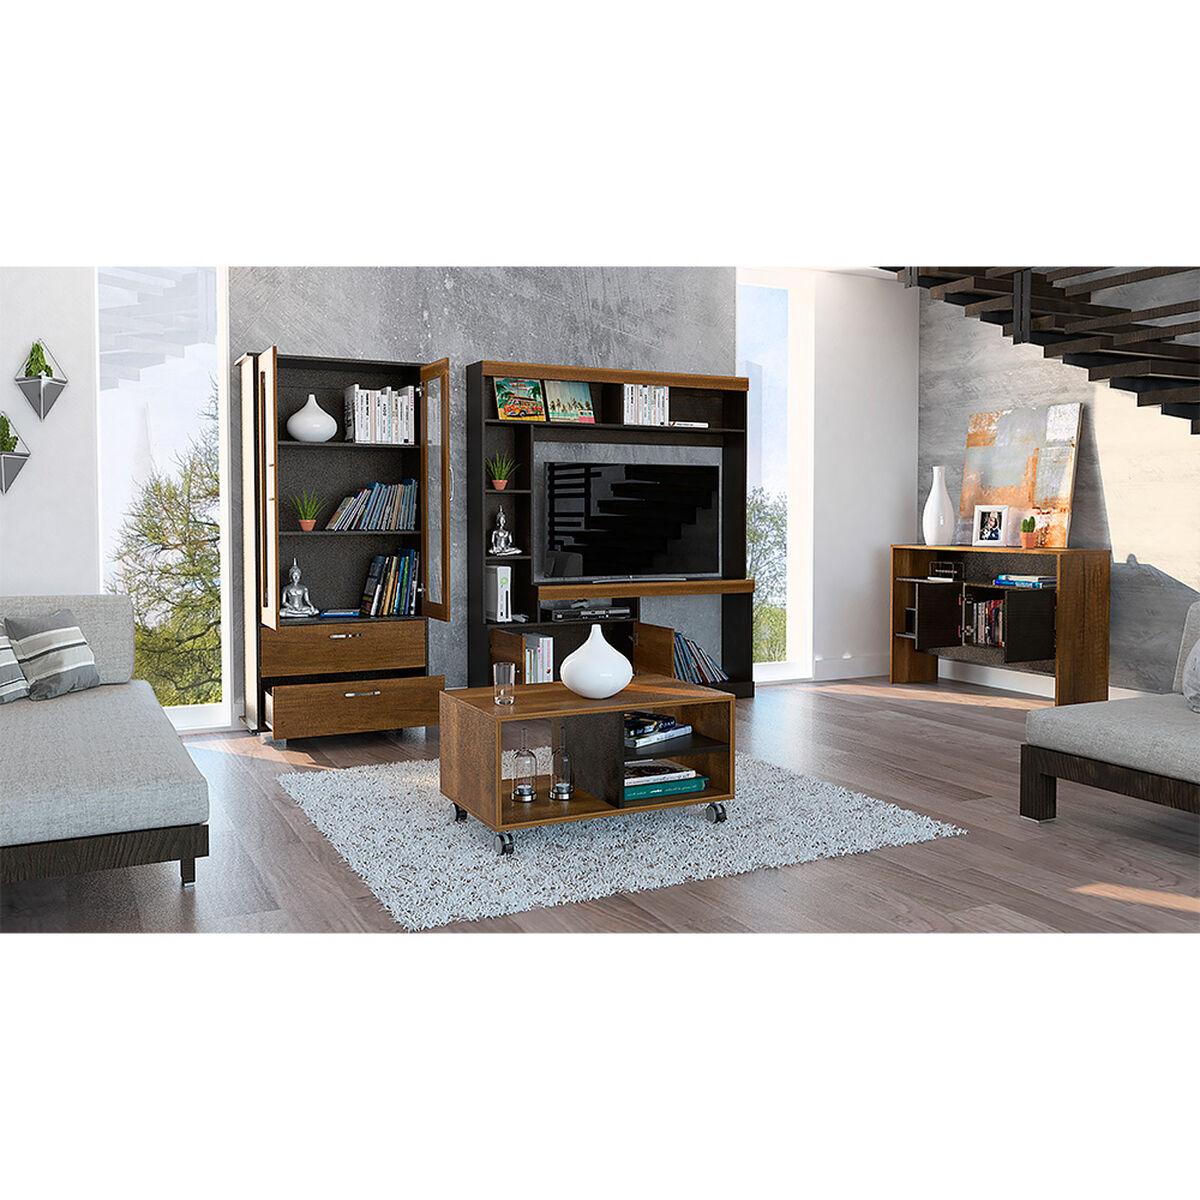 "Rack Tv 58"" + Vitrina + Arrimo + Mesa De Centro Classic Color"